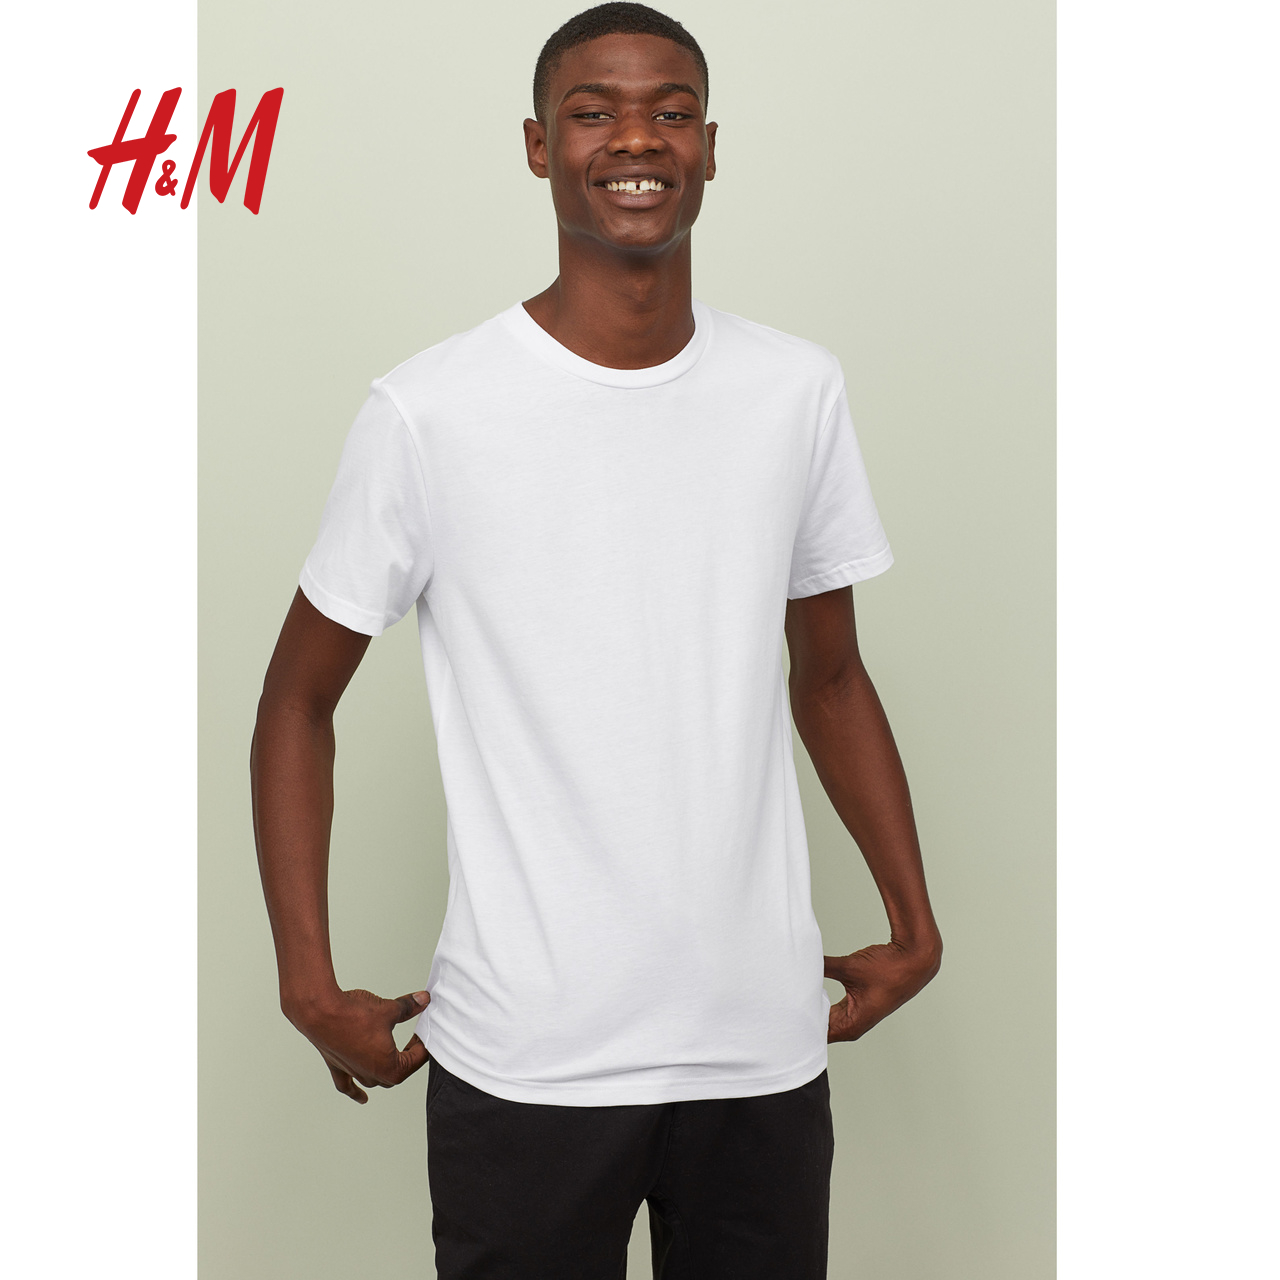 H&M HM DIVIDED男装新款纯色短袖T恤 男士夏季潮牌潮流HM0685836.50元包邮